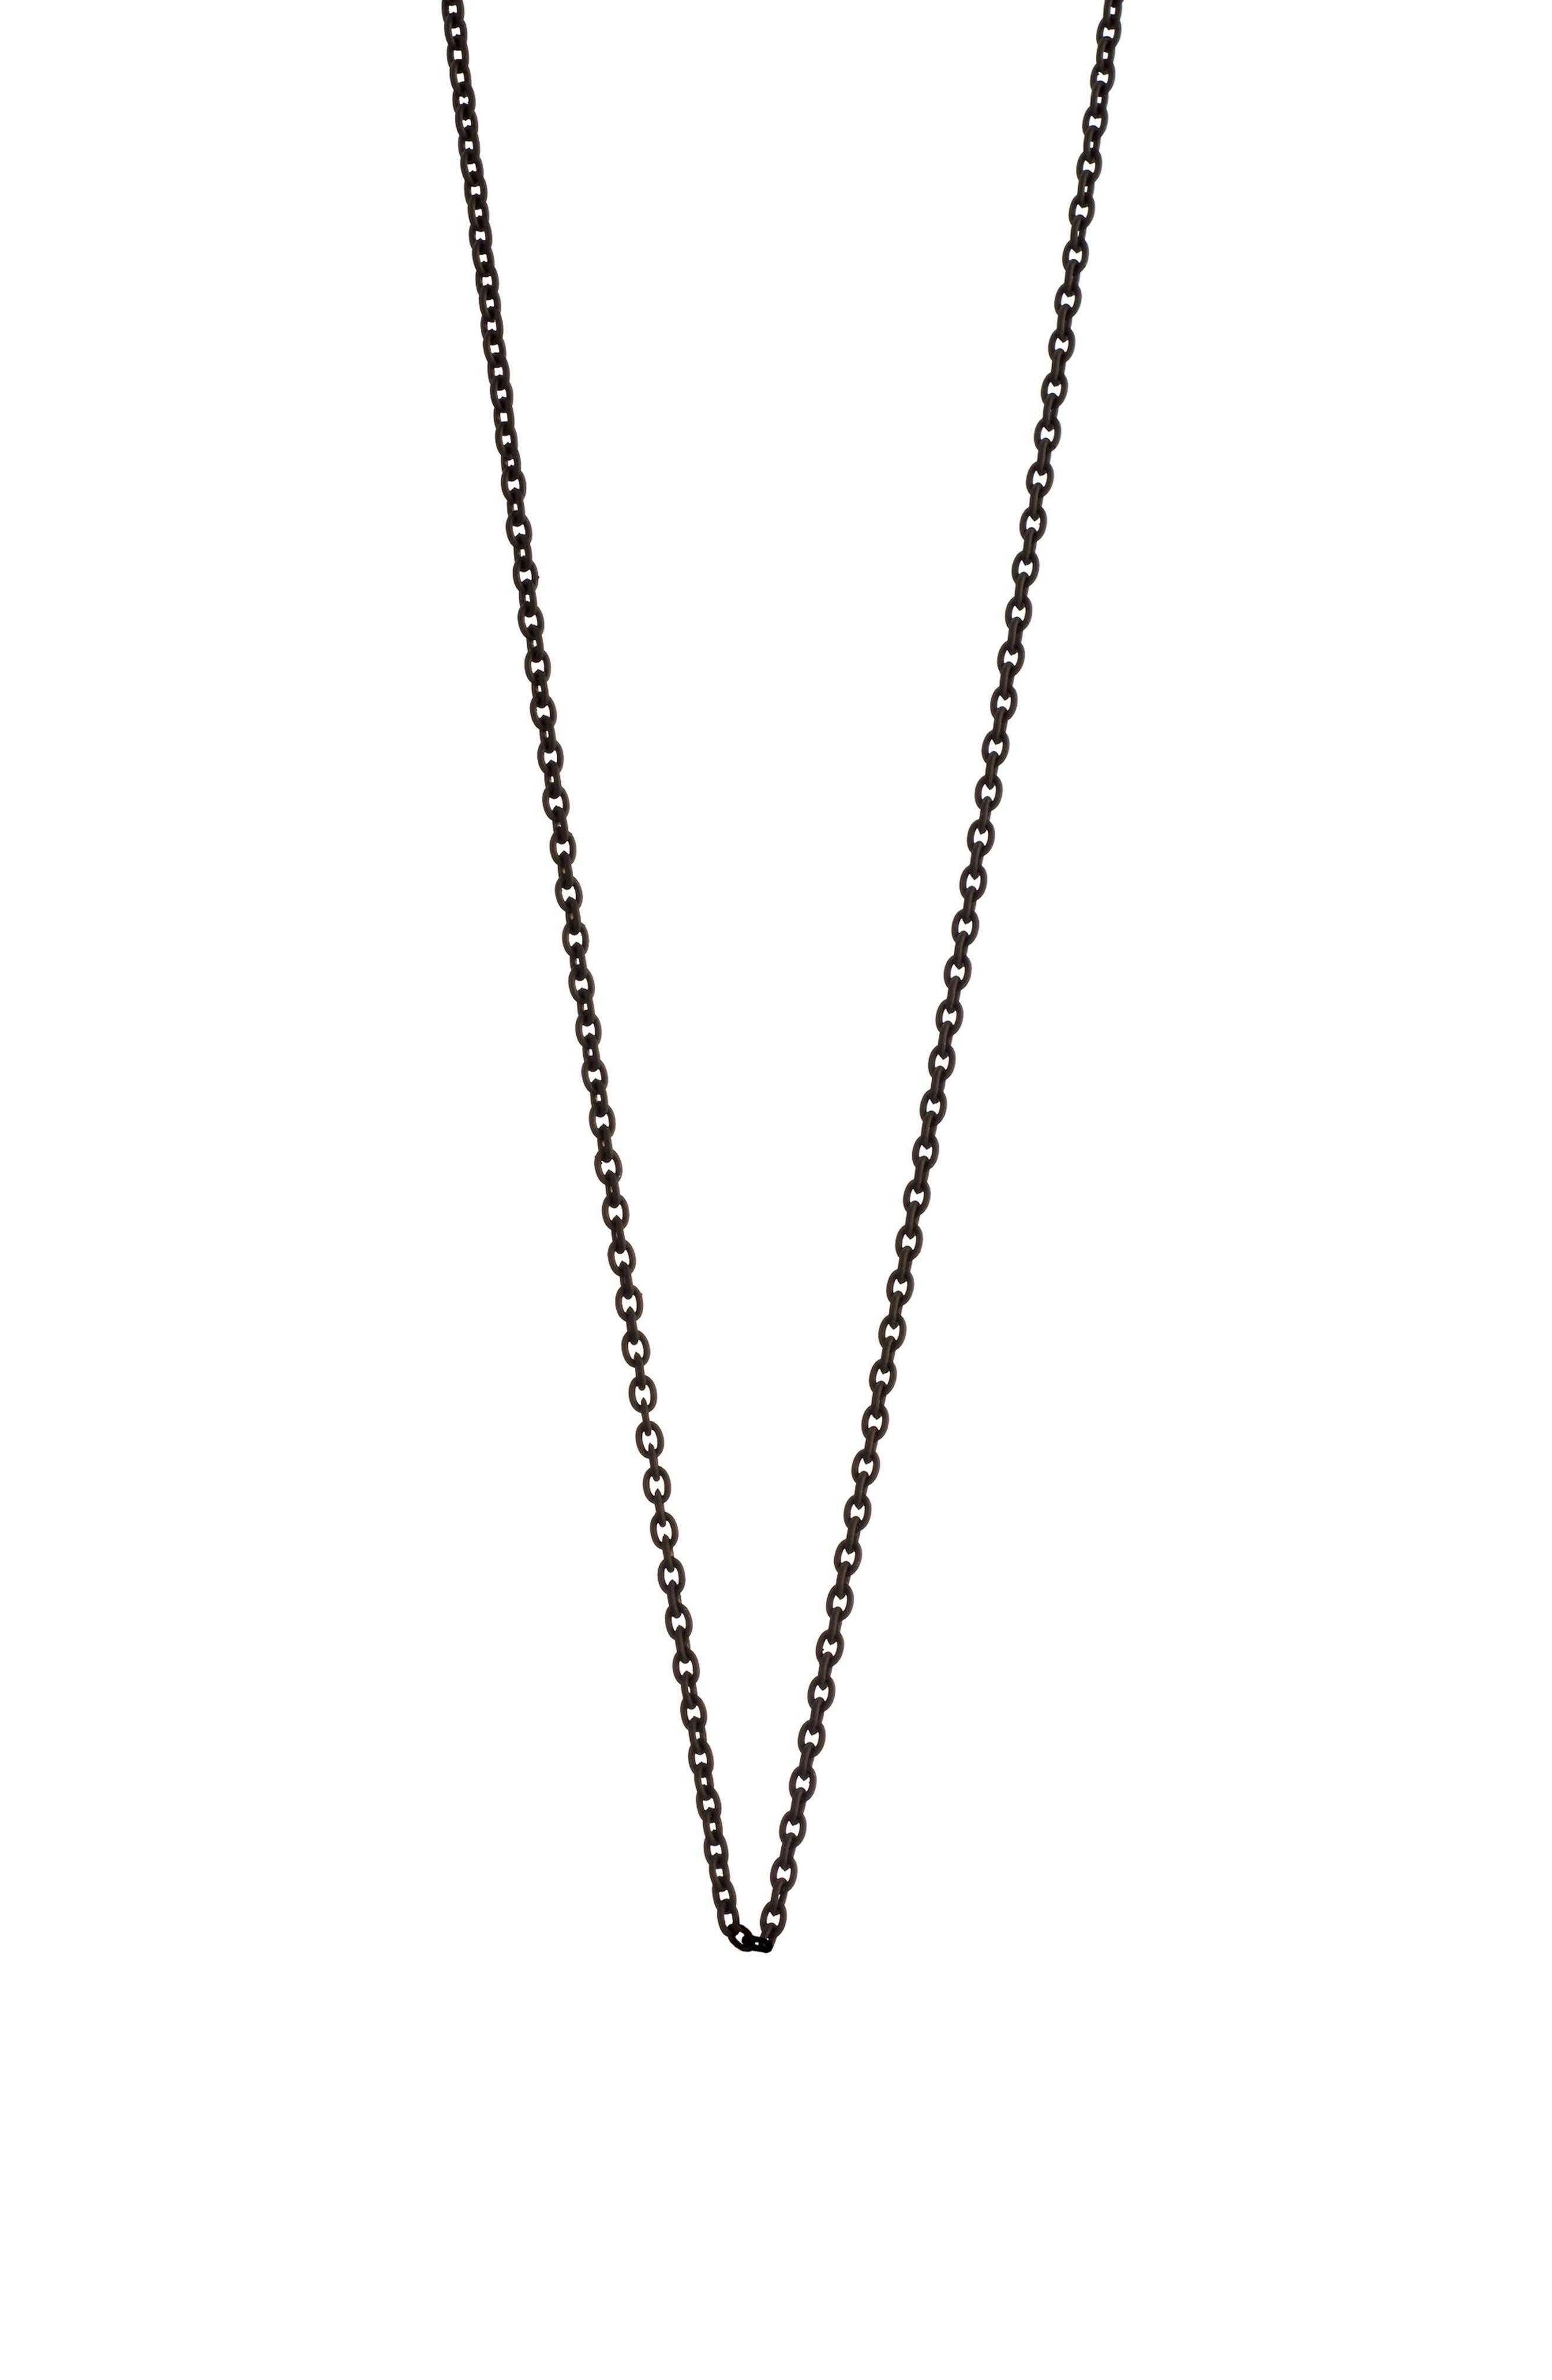 Black Steel Chain,                         Main,                         color, BLACK STEEL